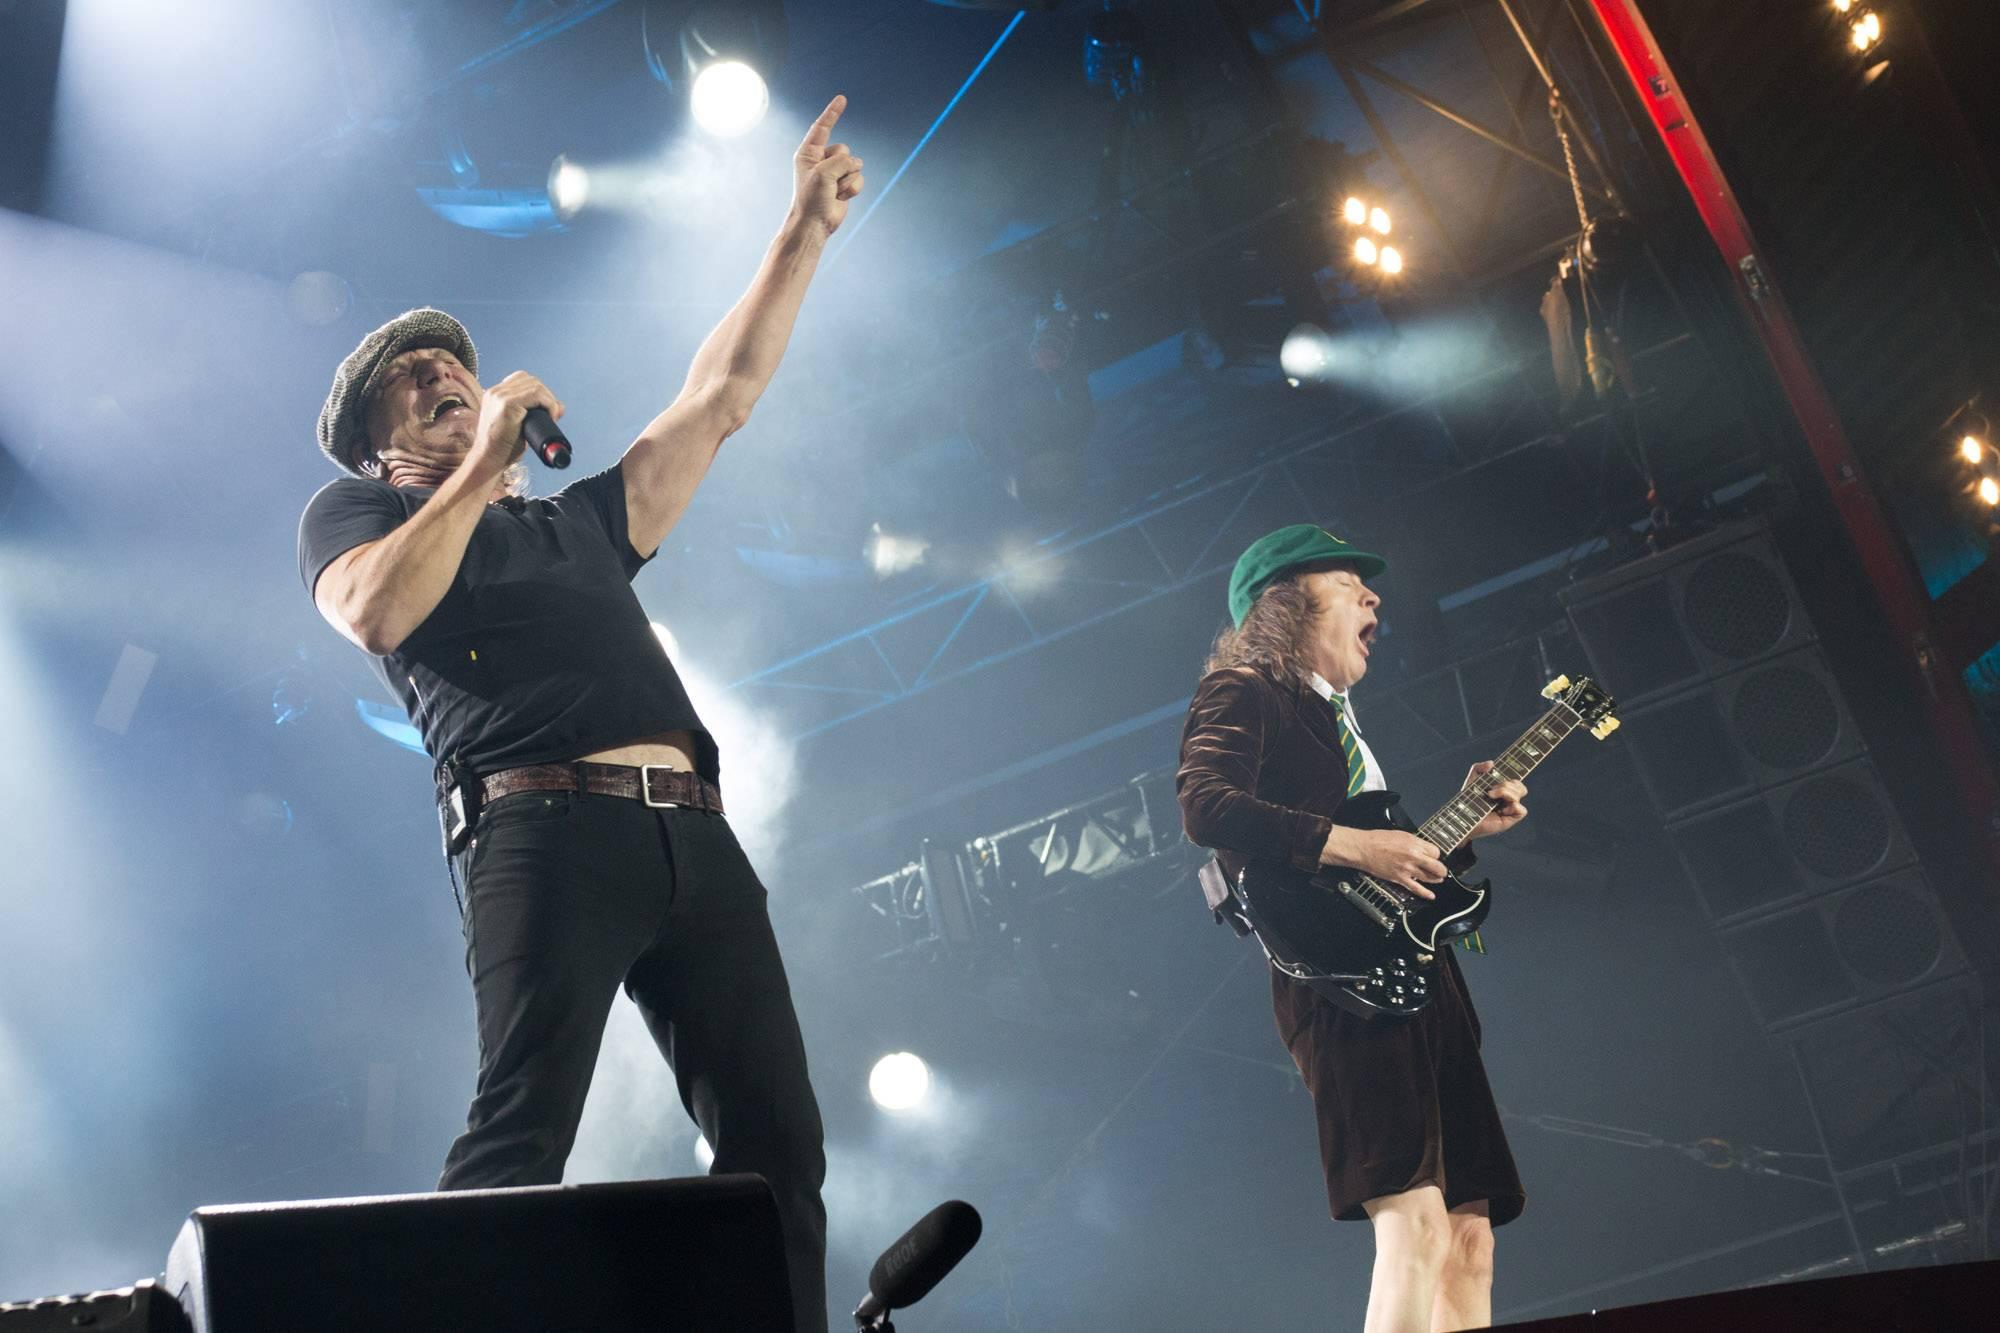 AC/DC at BC Place, Vancouver, Sept 22 2015. Kirk Chantraine photo.